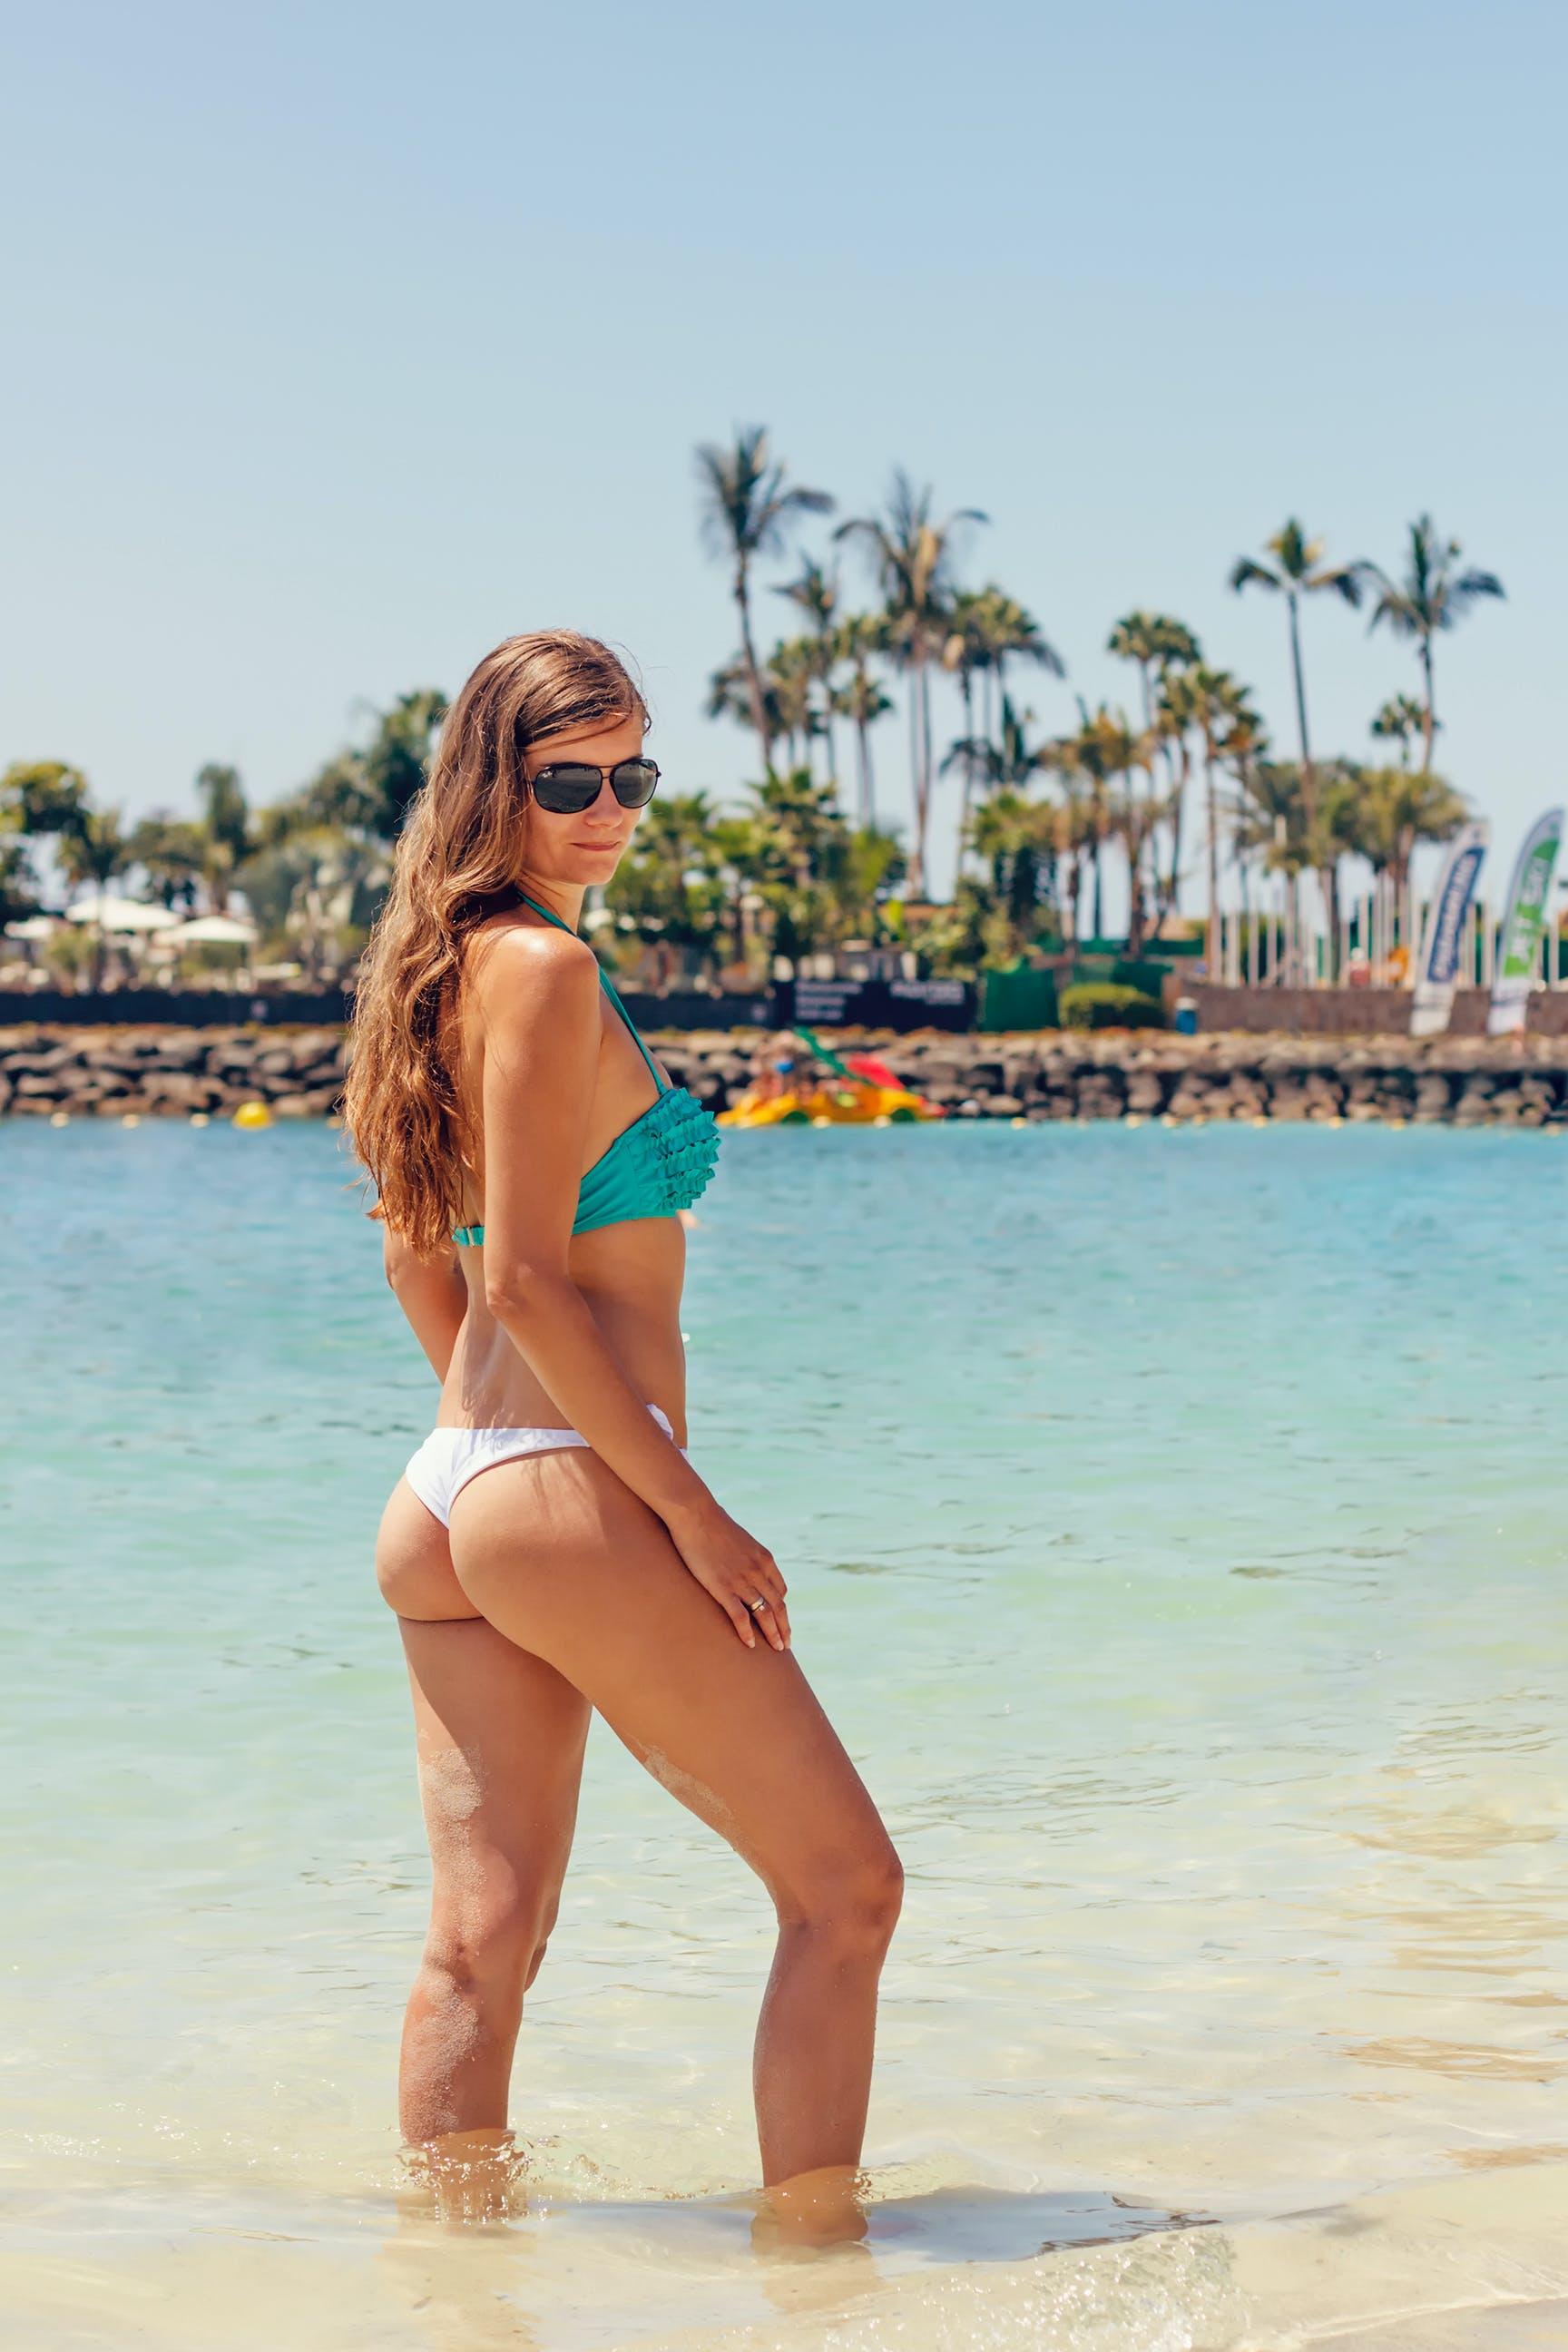 Free stock photo of beach, bikini, female, ocean